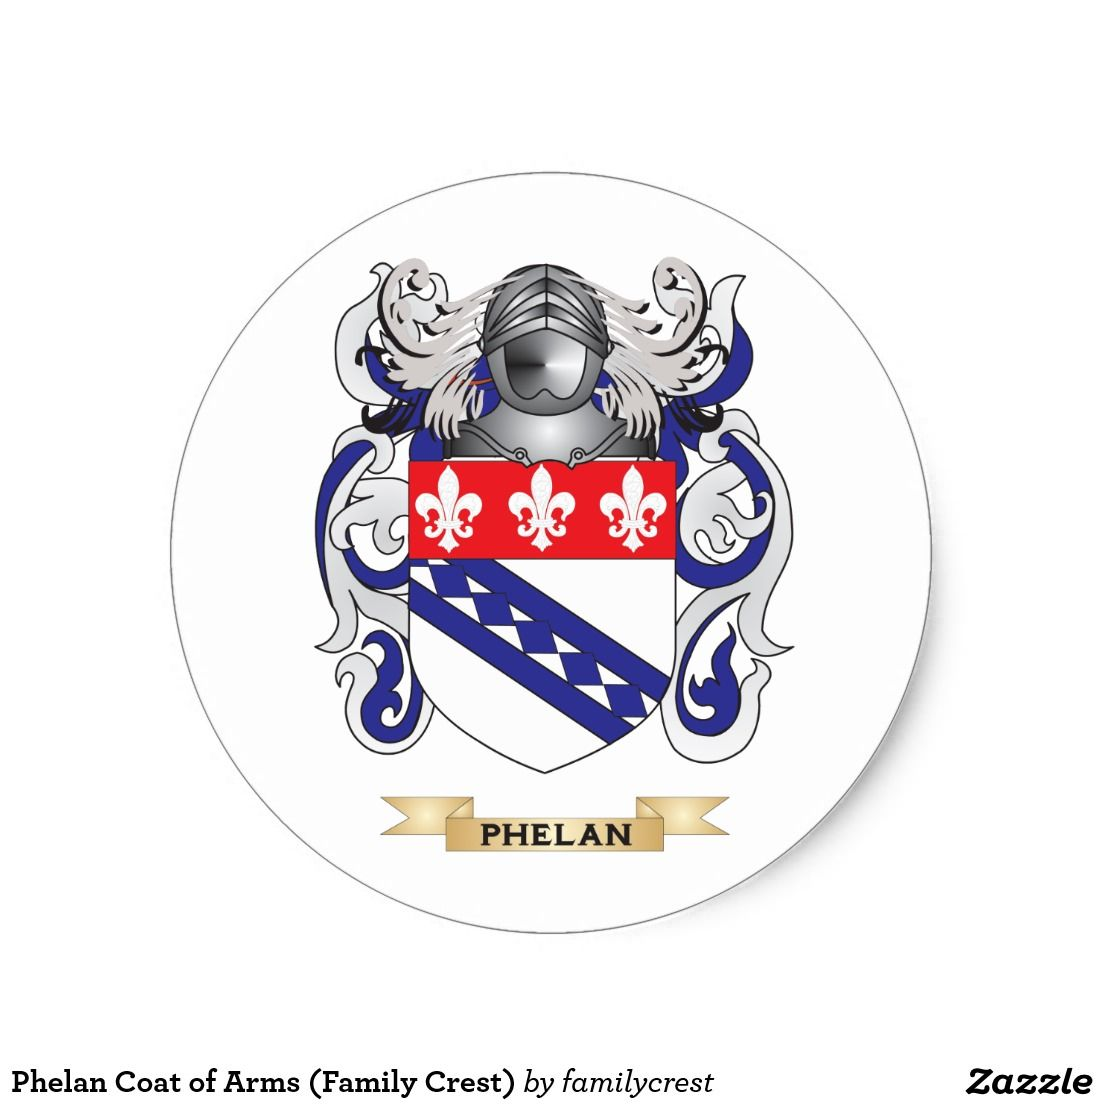 Phelan Crest